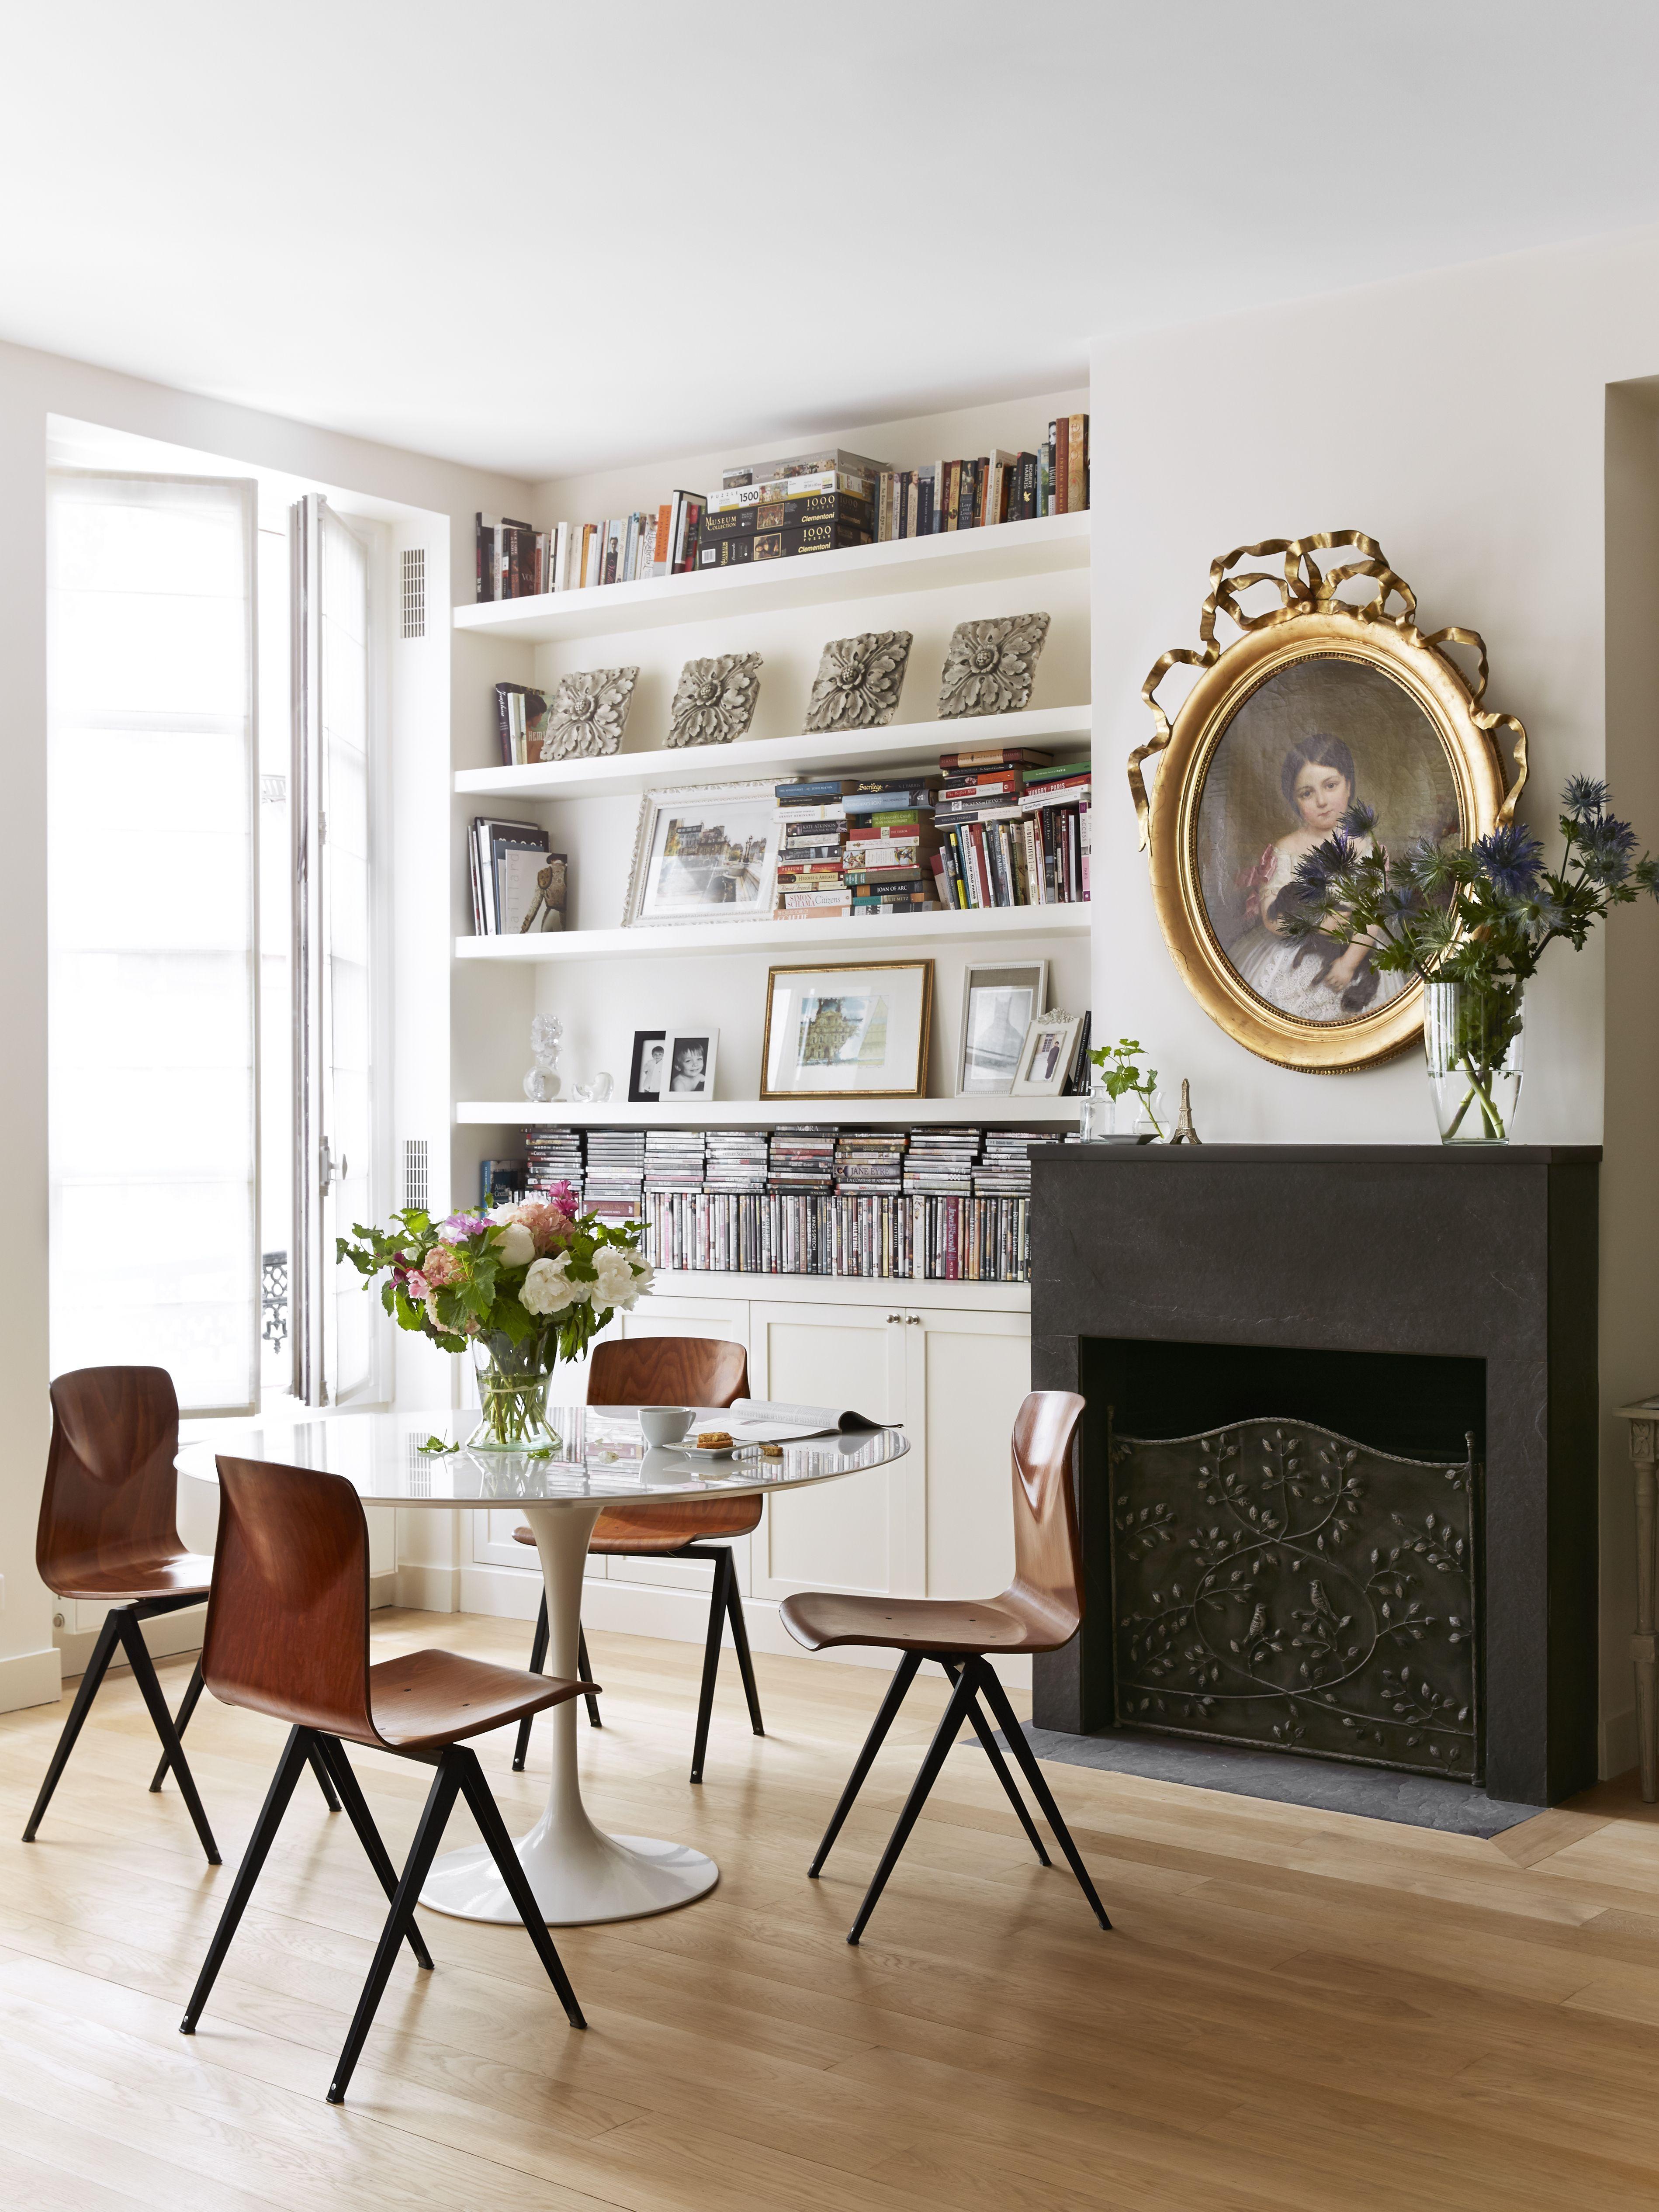 Dining Room Photographer: Idha Lindhag. Paris ApartmentsLuxury Apartments Decor ...